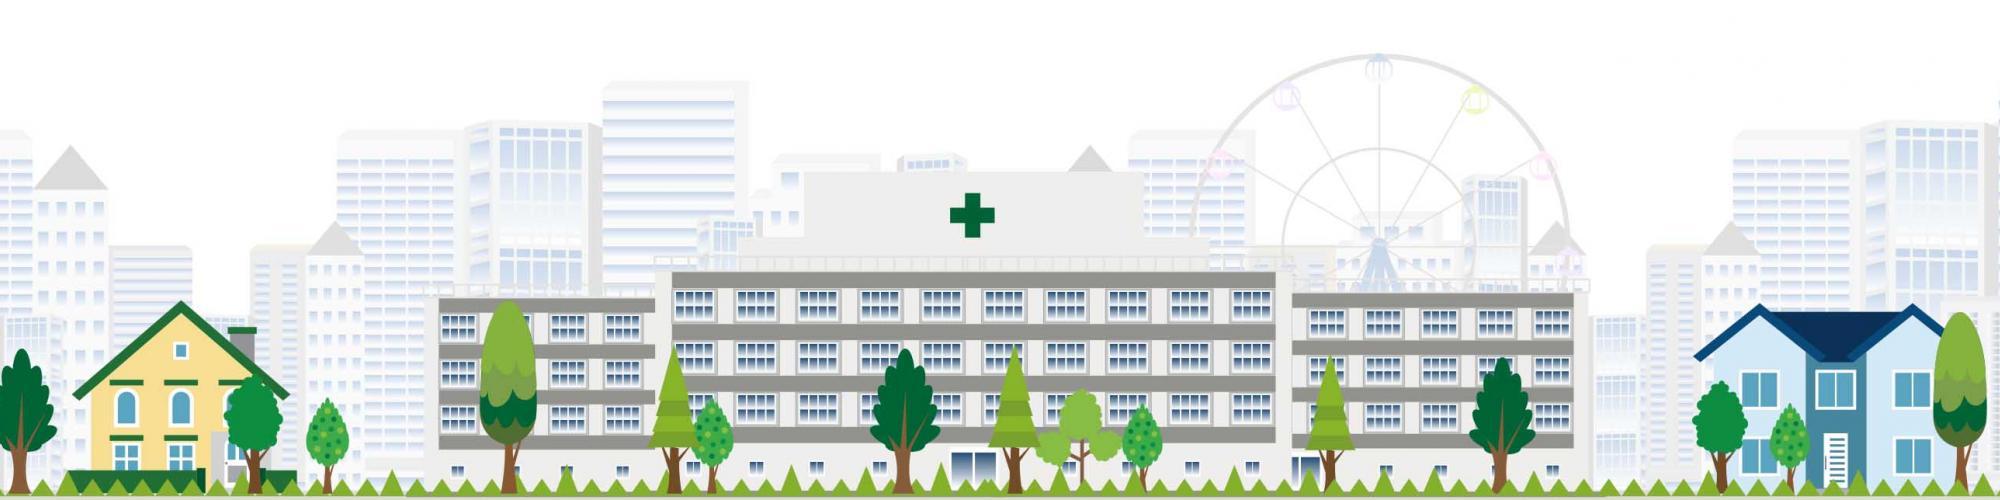 KMG Klinikum Sömmerda